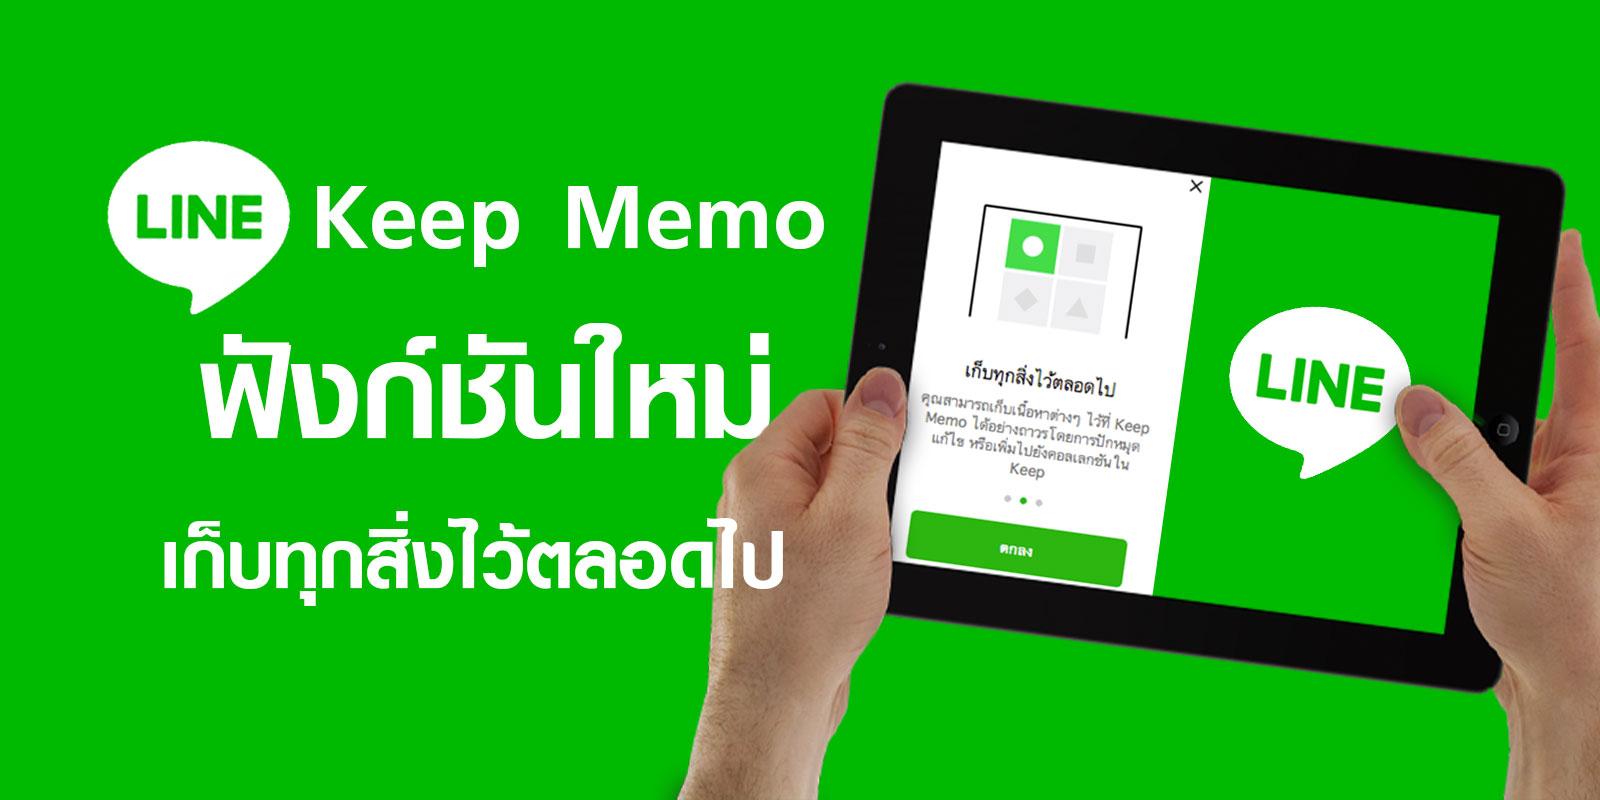 Line Keep Memo APPLICATIONS ฝากแปะข้อความไว้กับตัวเอง